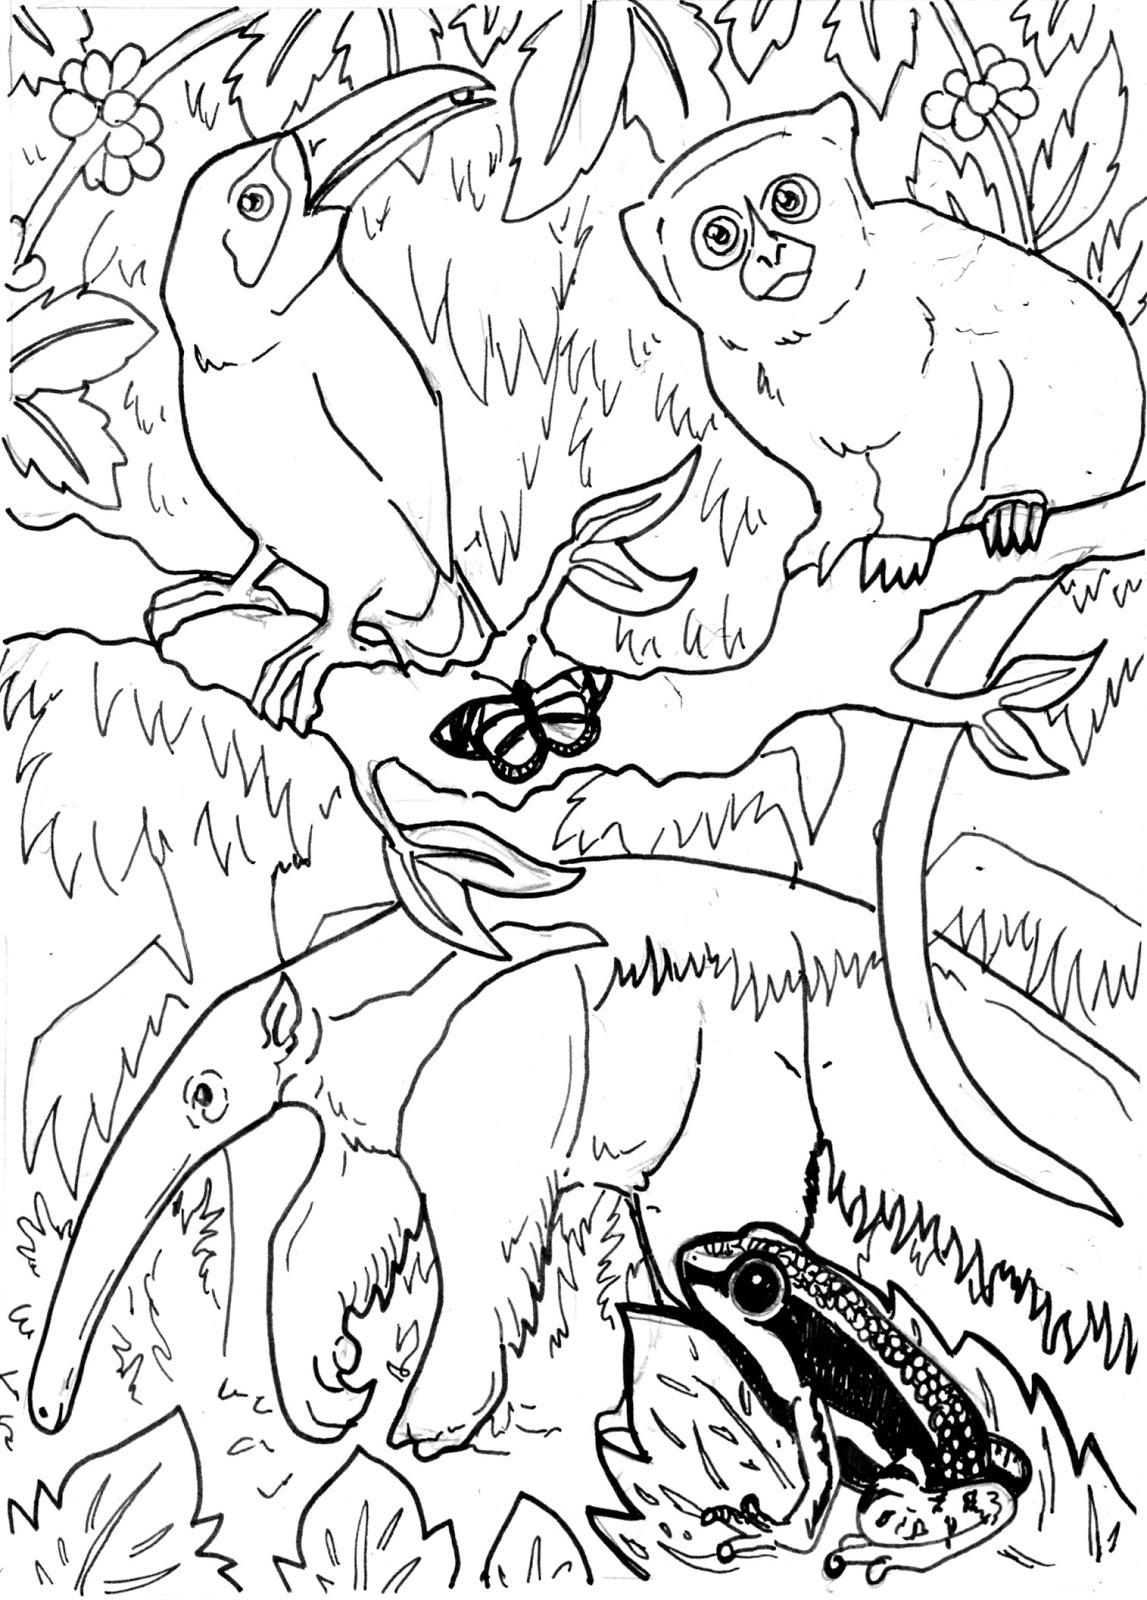 Drawn rainforest Colouring Pages The LemurKat: The